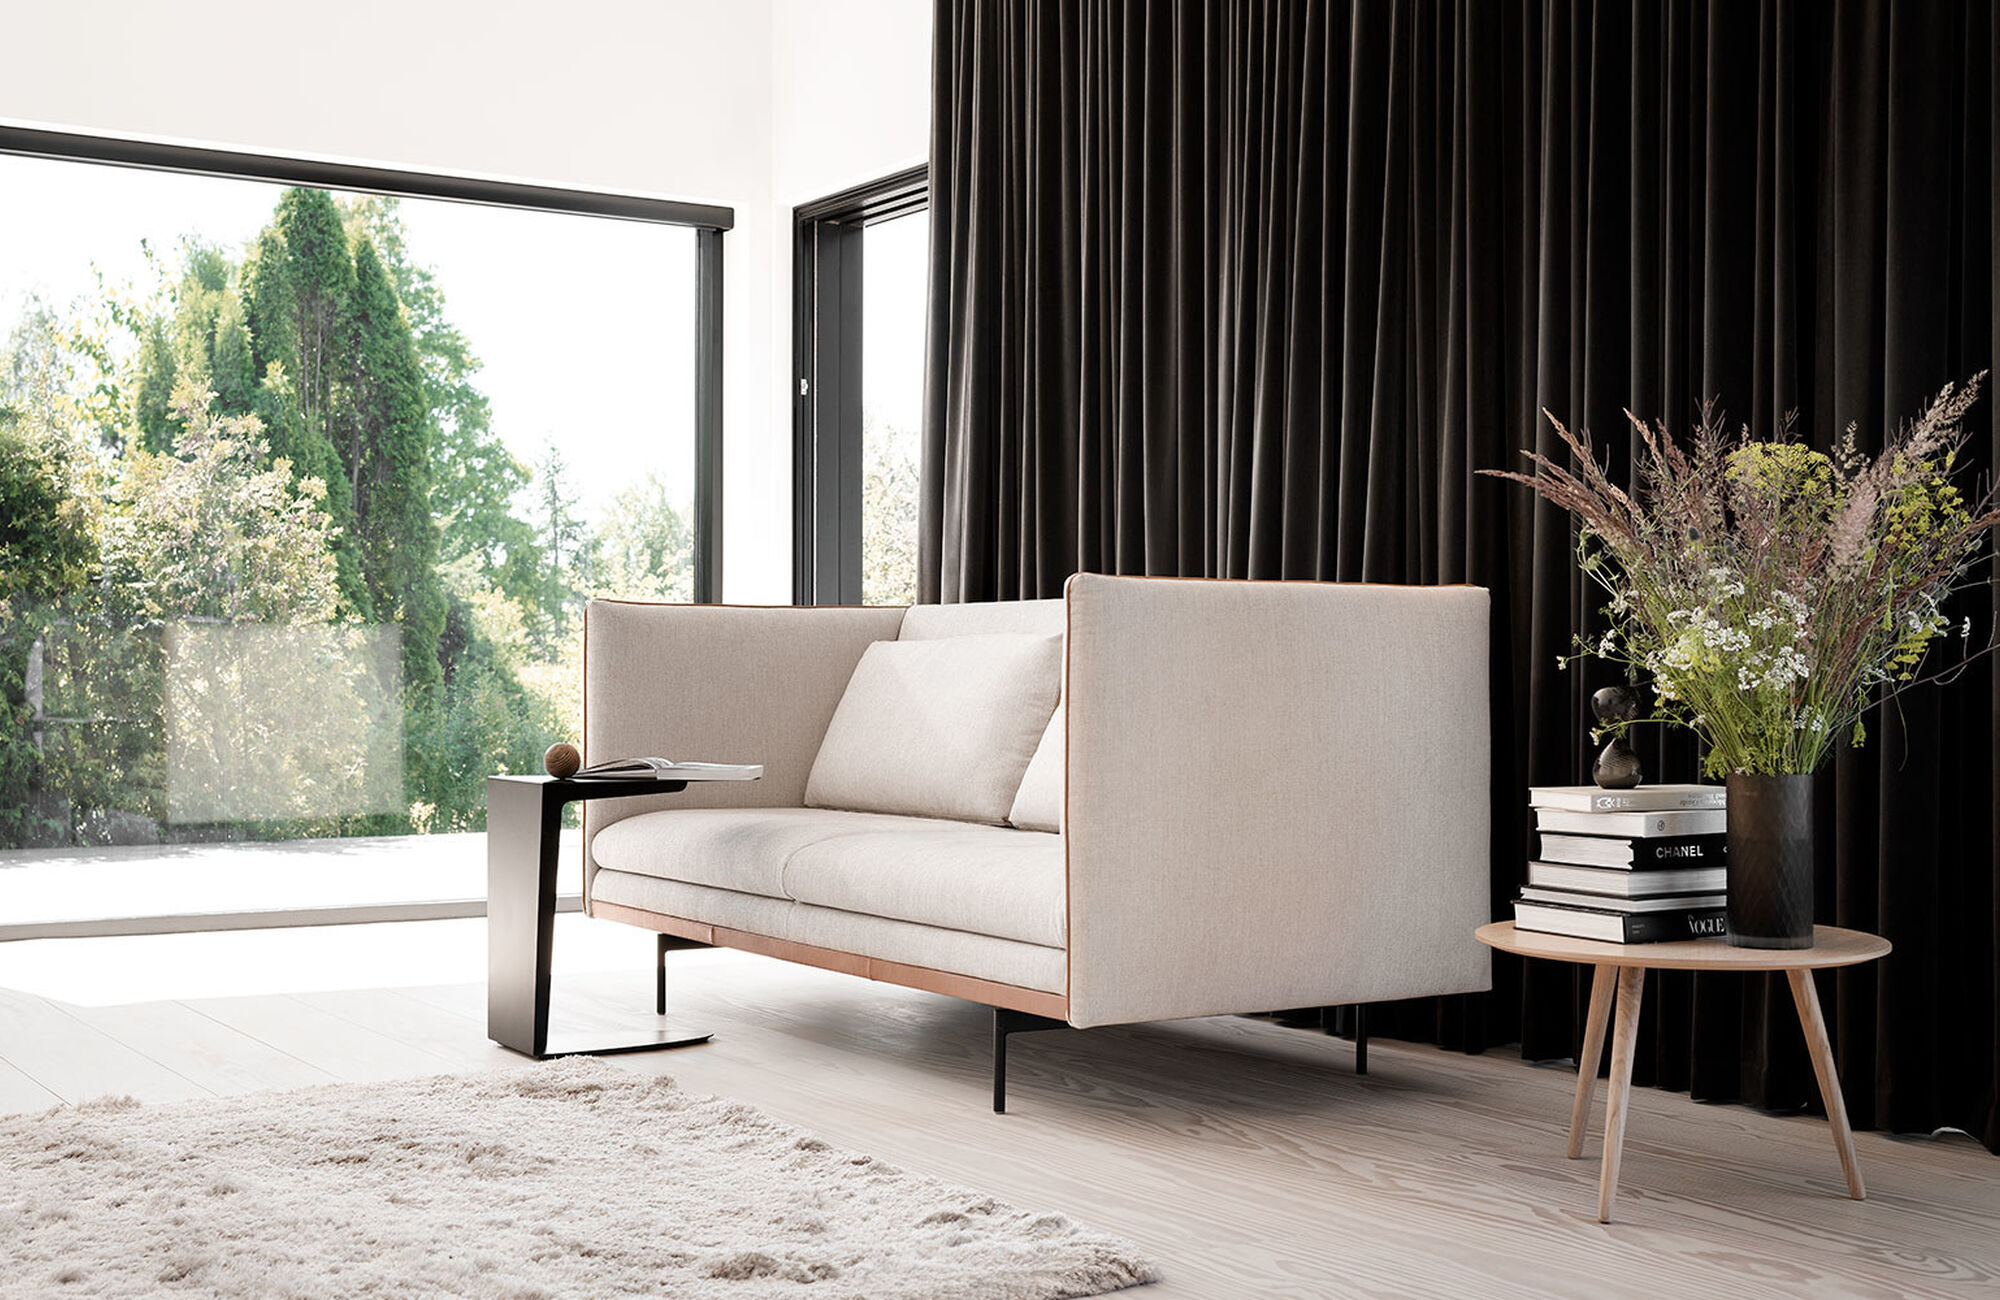 Accesorios para muebles - Cojines de sofá Nantes